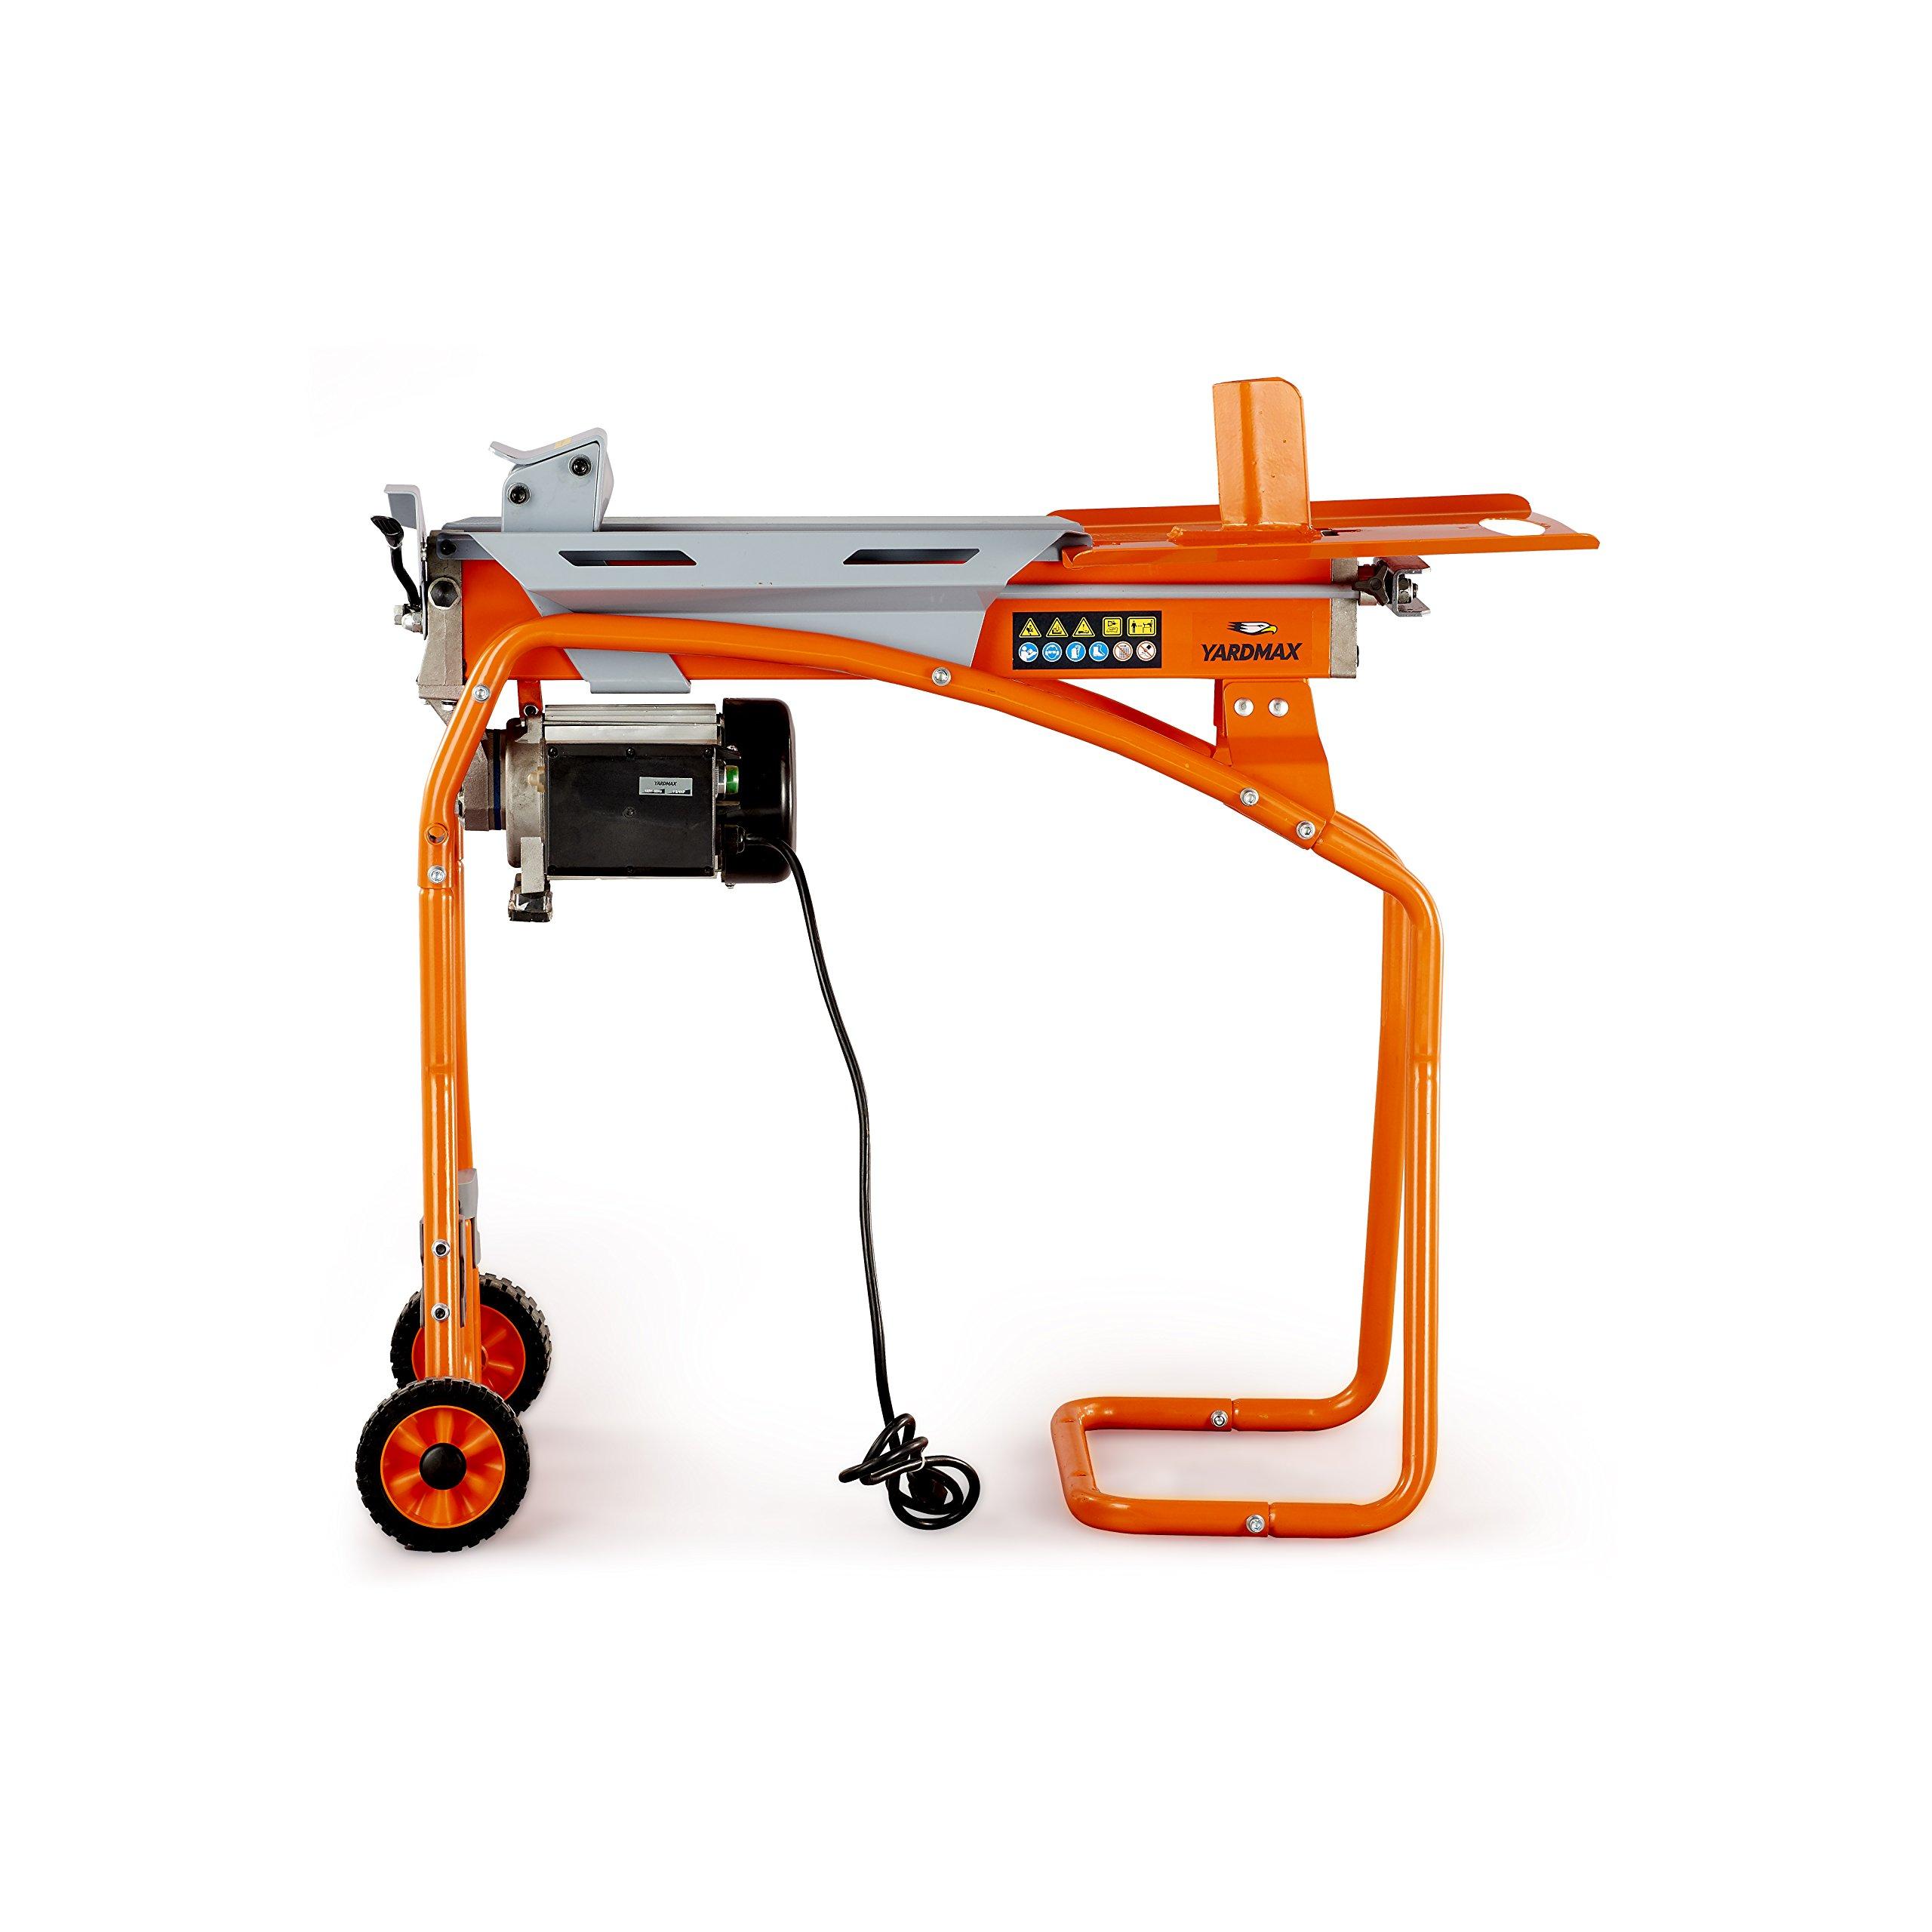 YARDMAX YS0552 Electric Splitter Stand